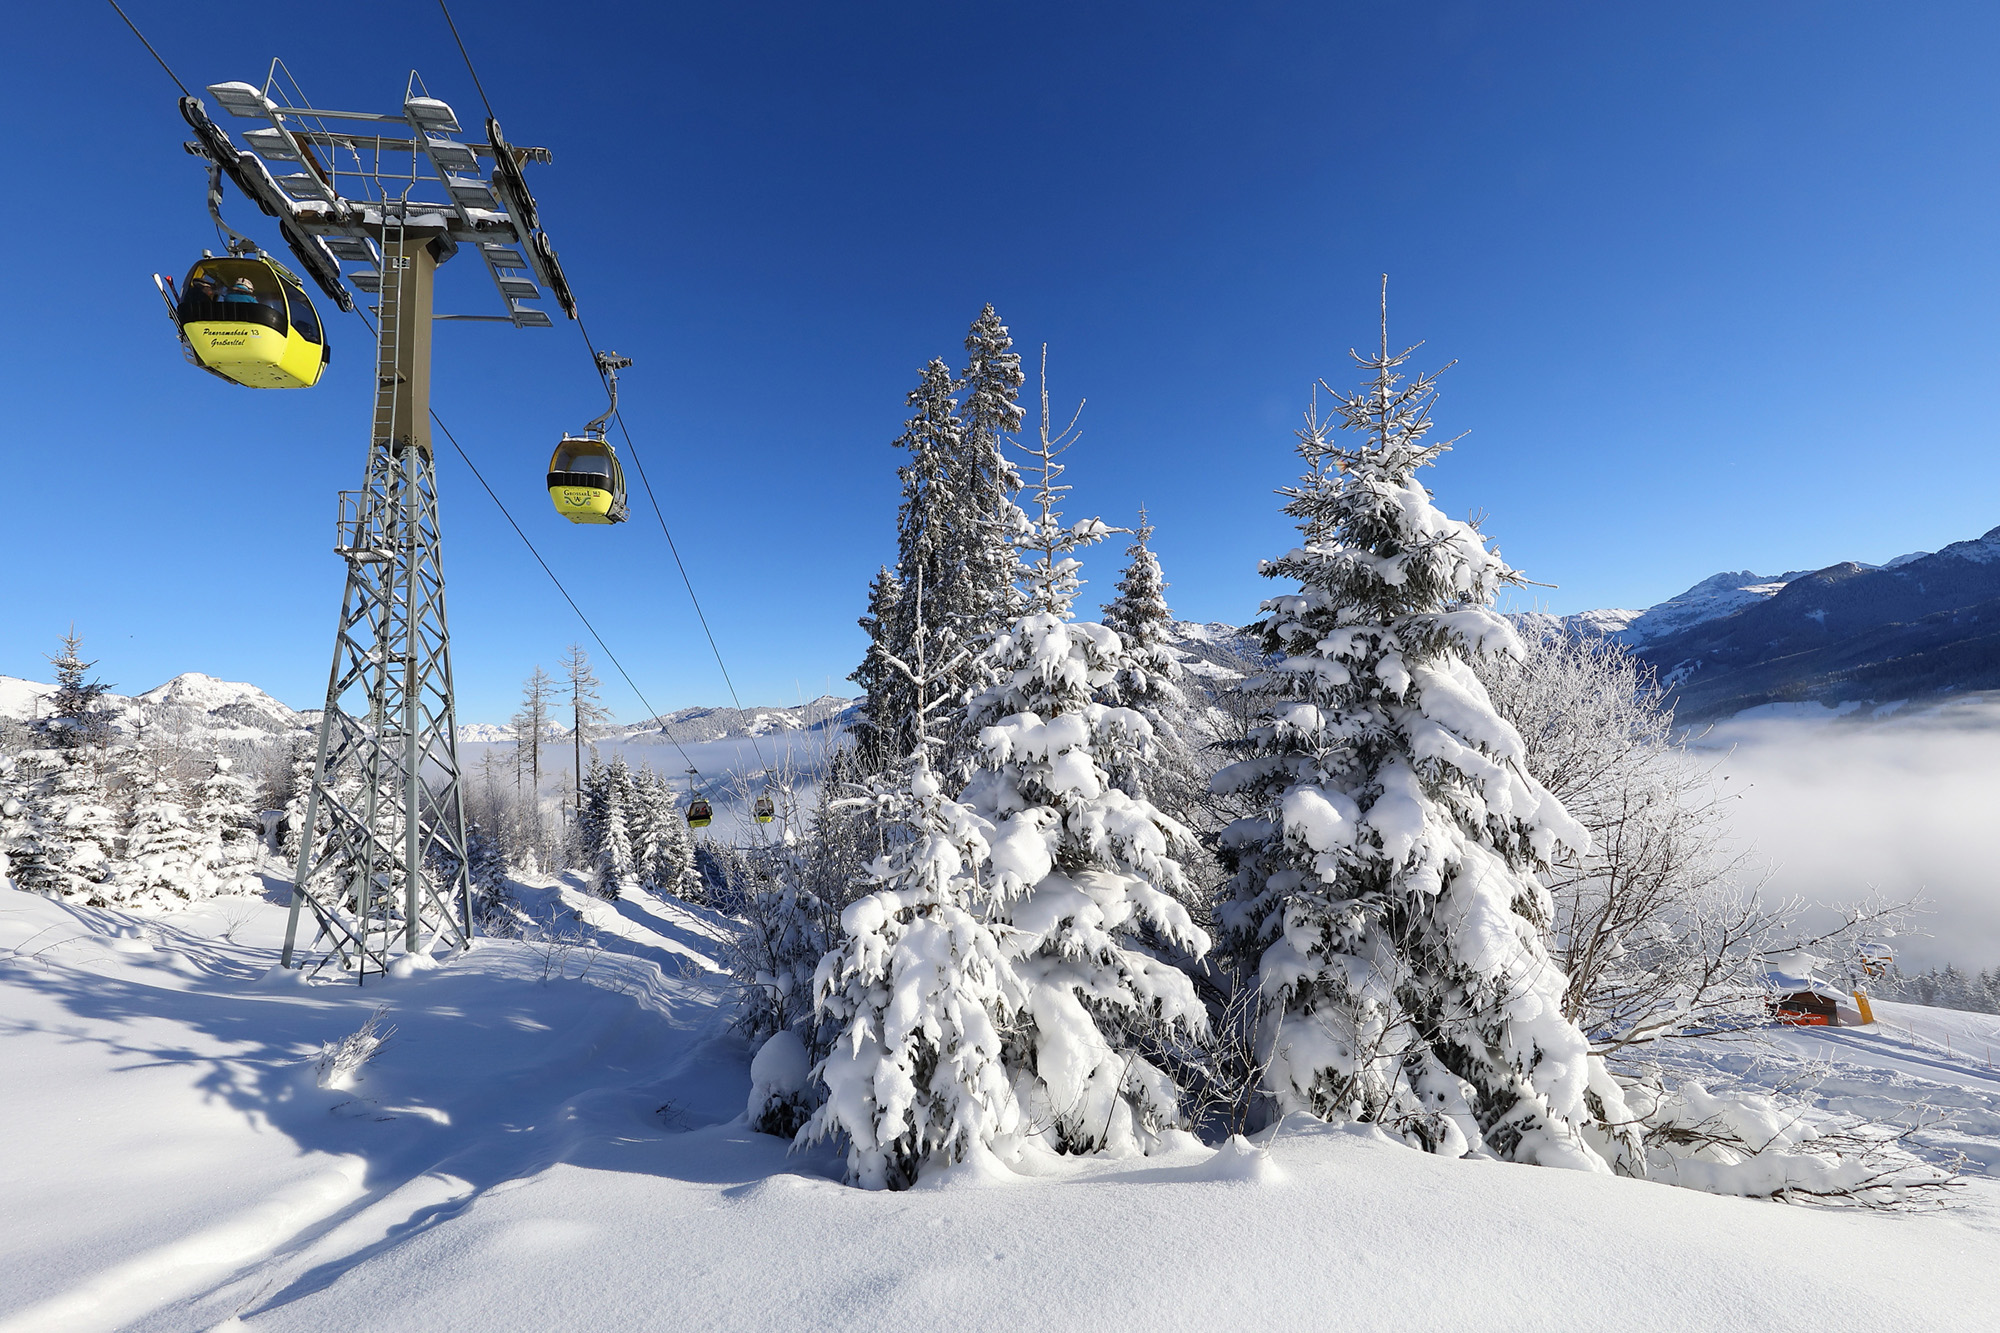 Grossarltal-Dorfgastein ski area in Ski amadé